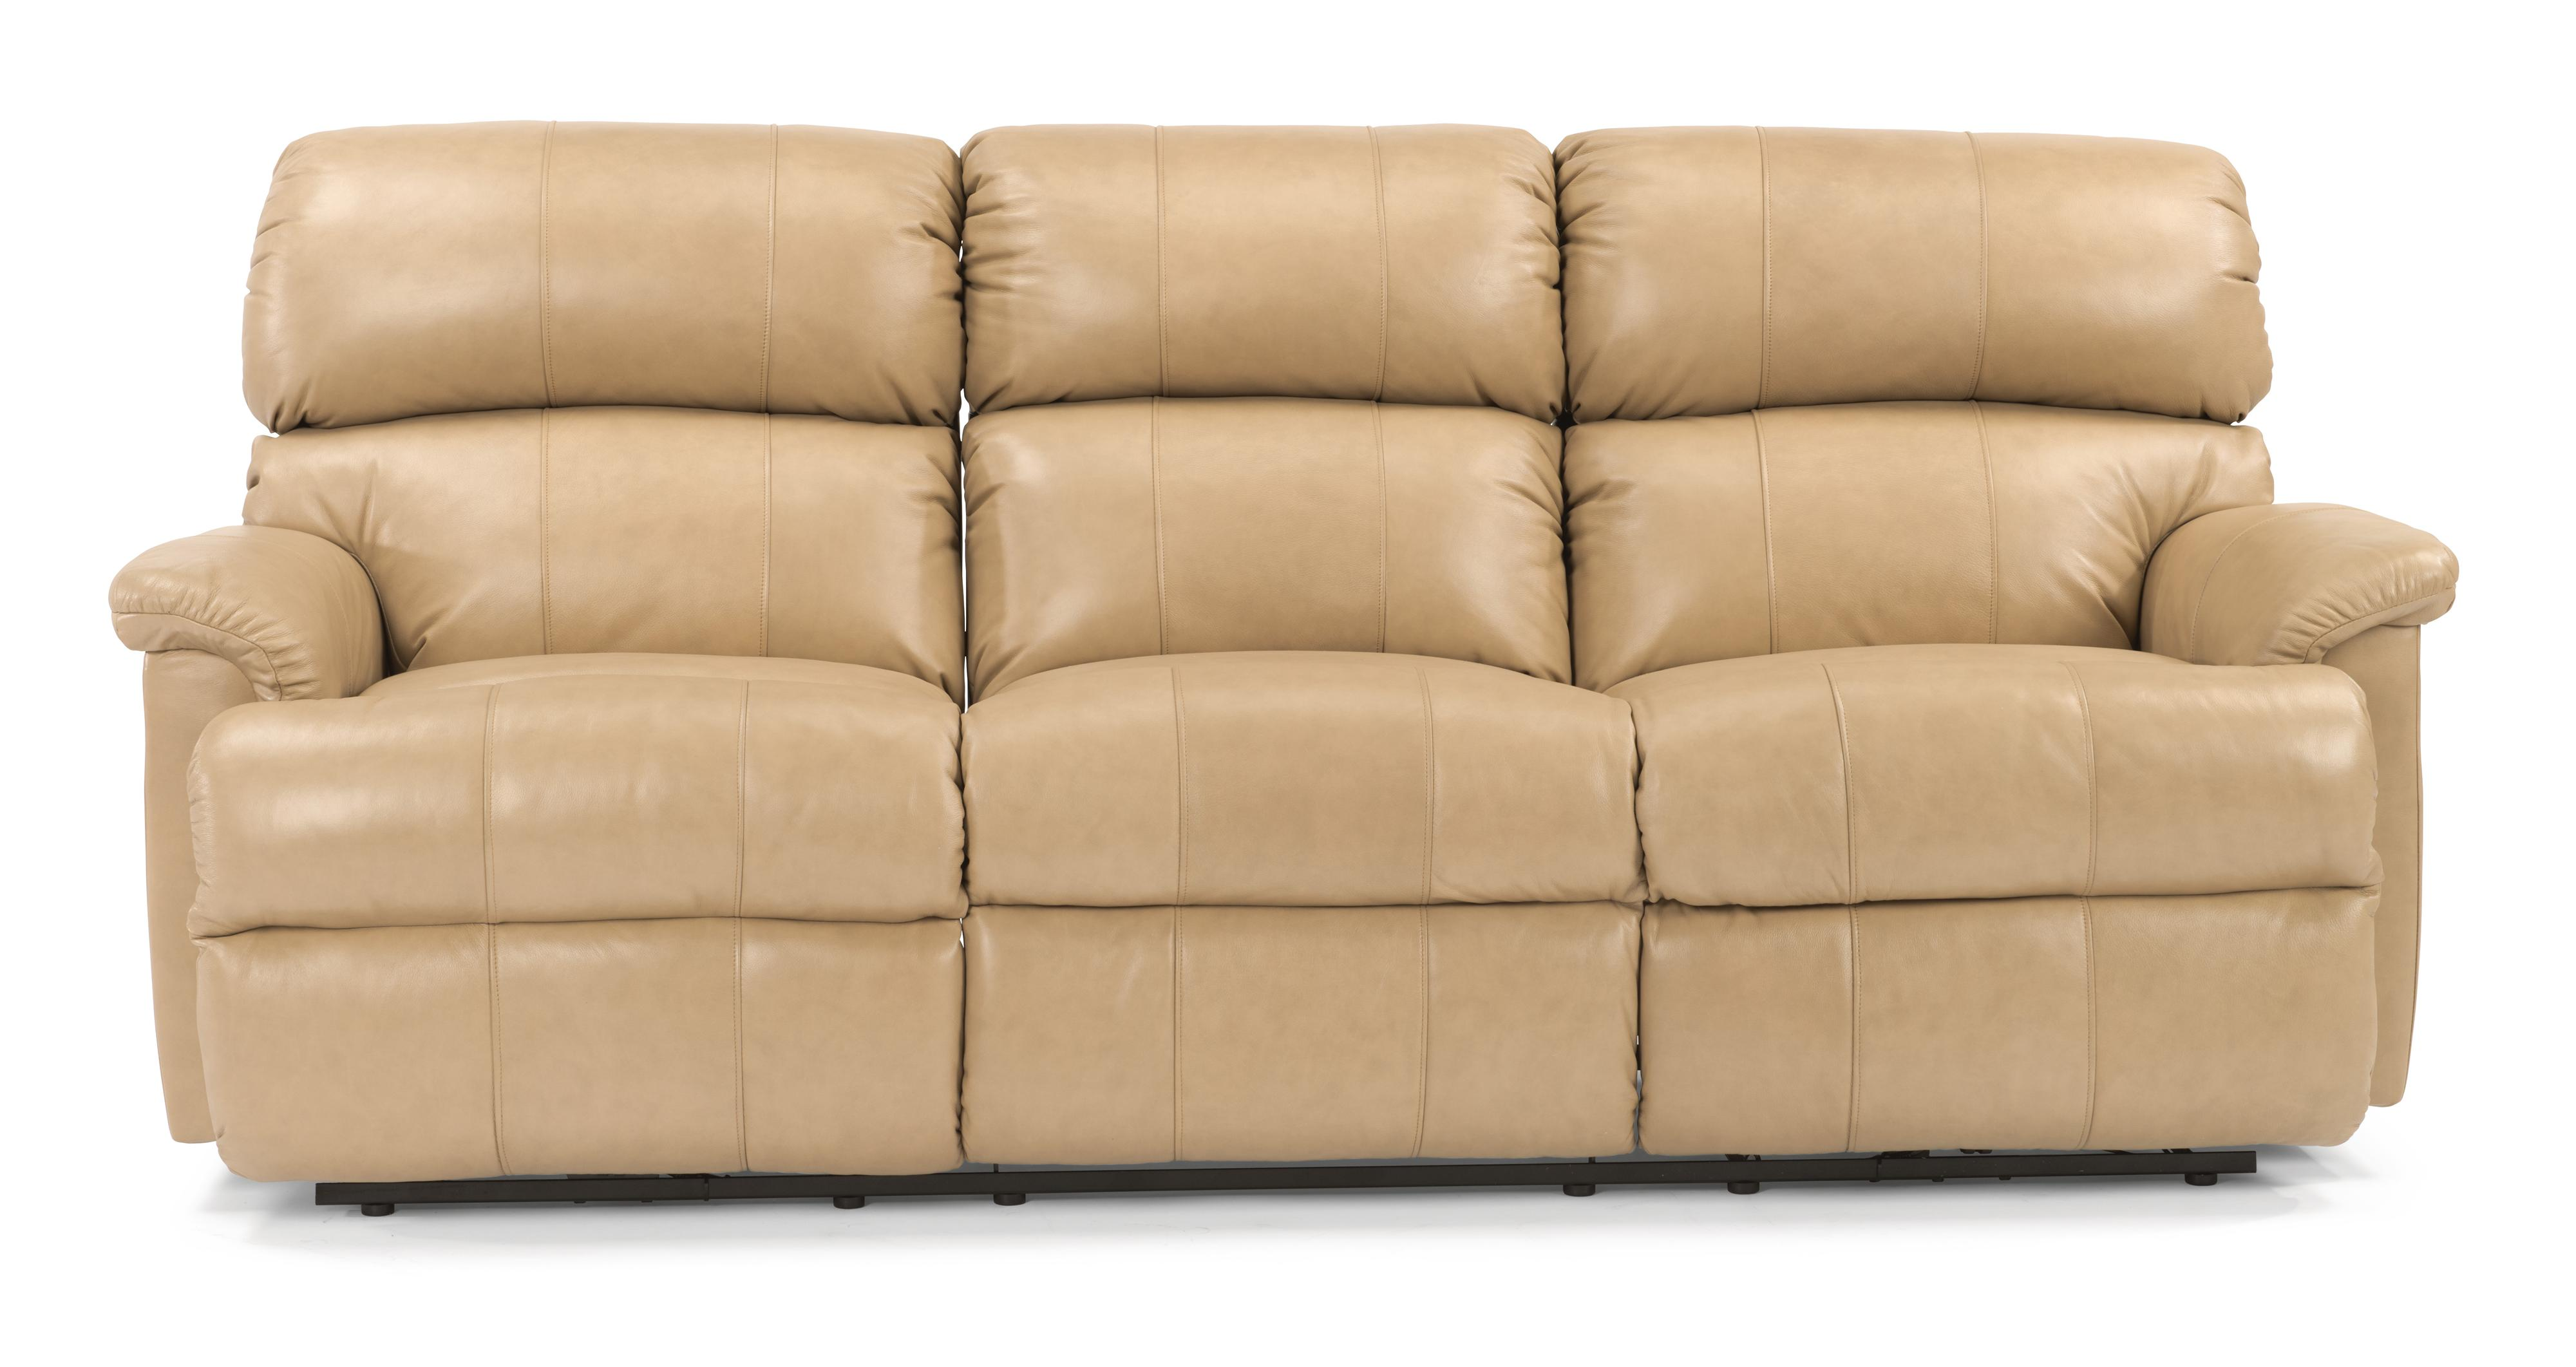 flexsteel capitol double reclining sofa full size flip chicago 3066 62 87 quot